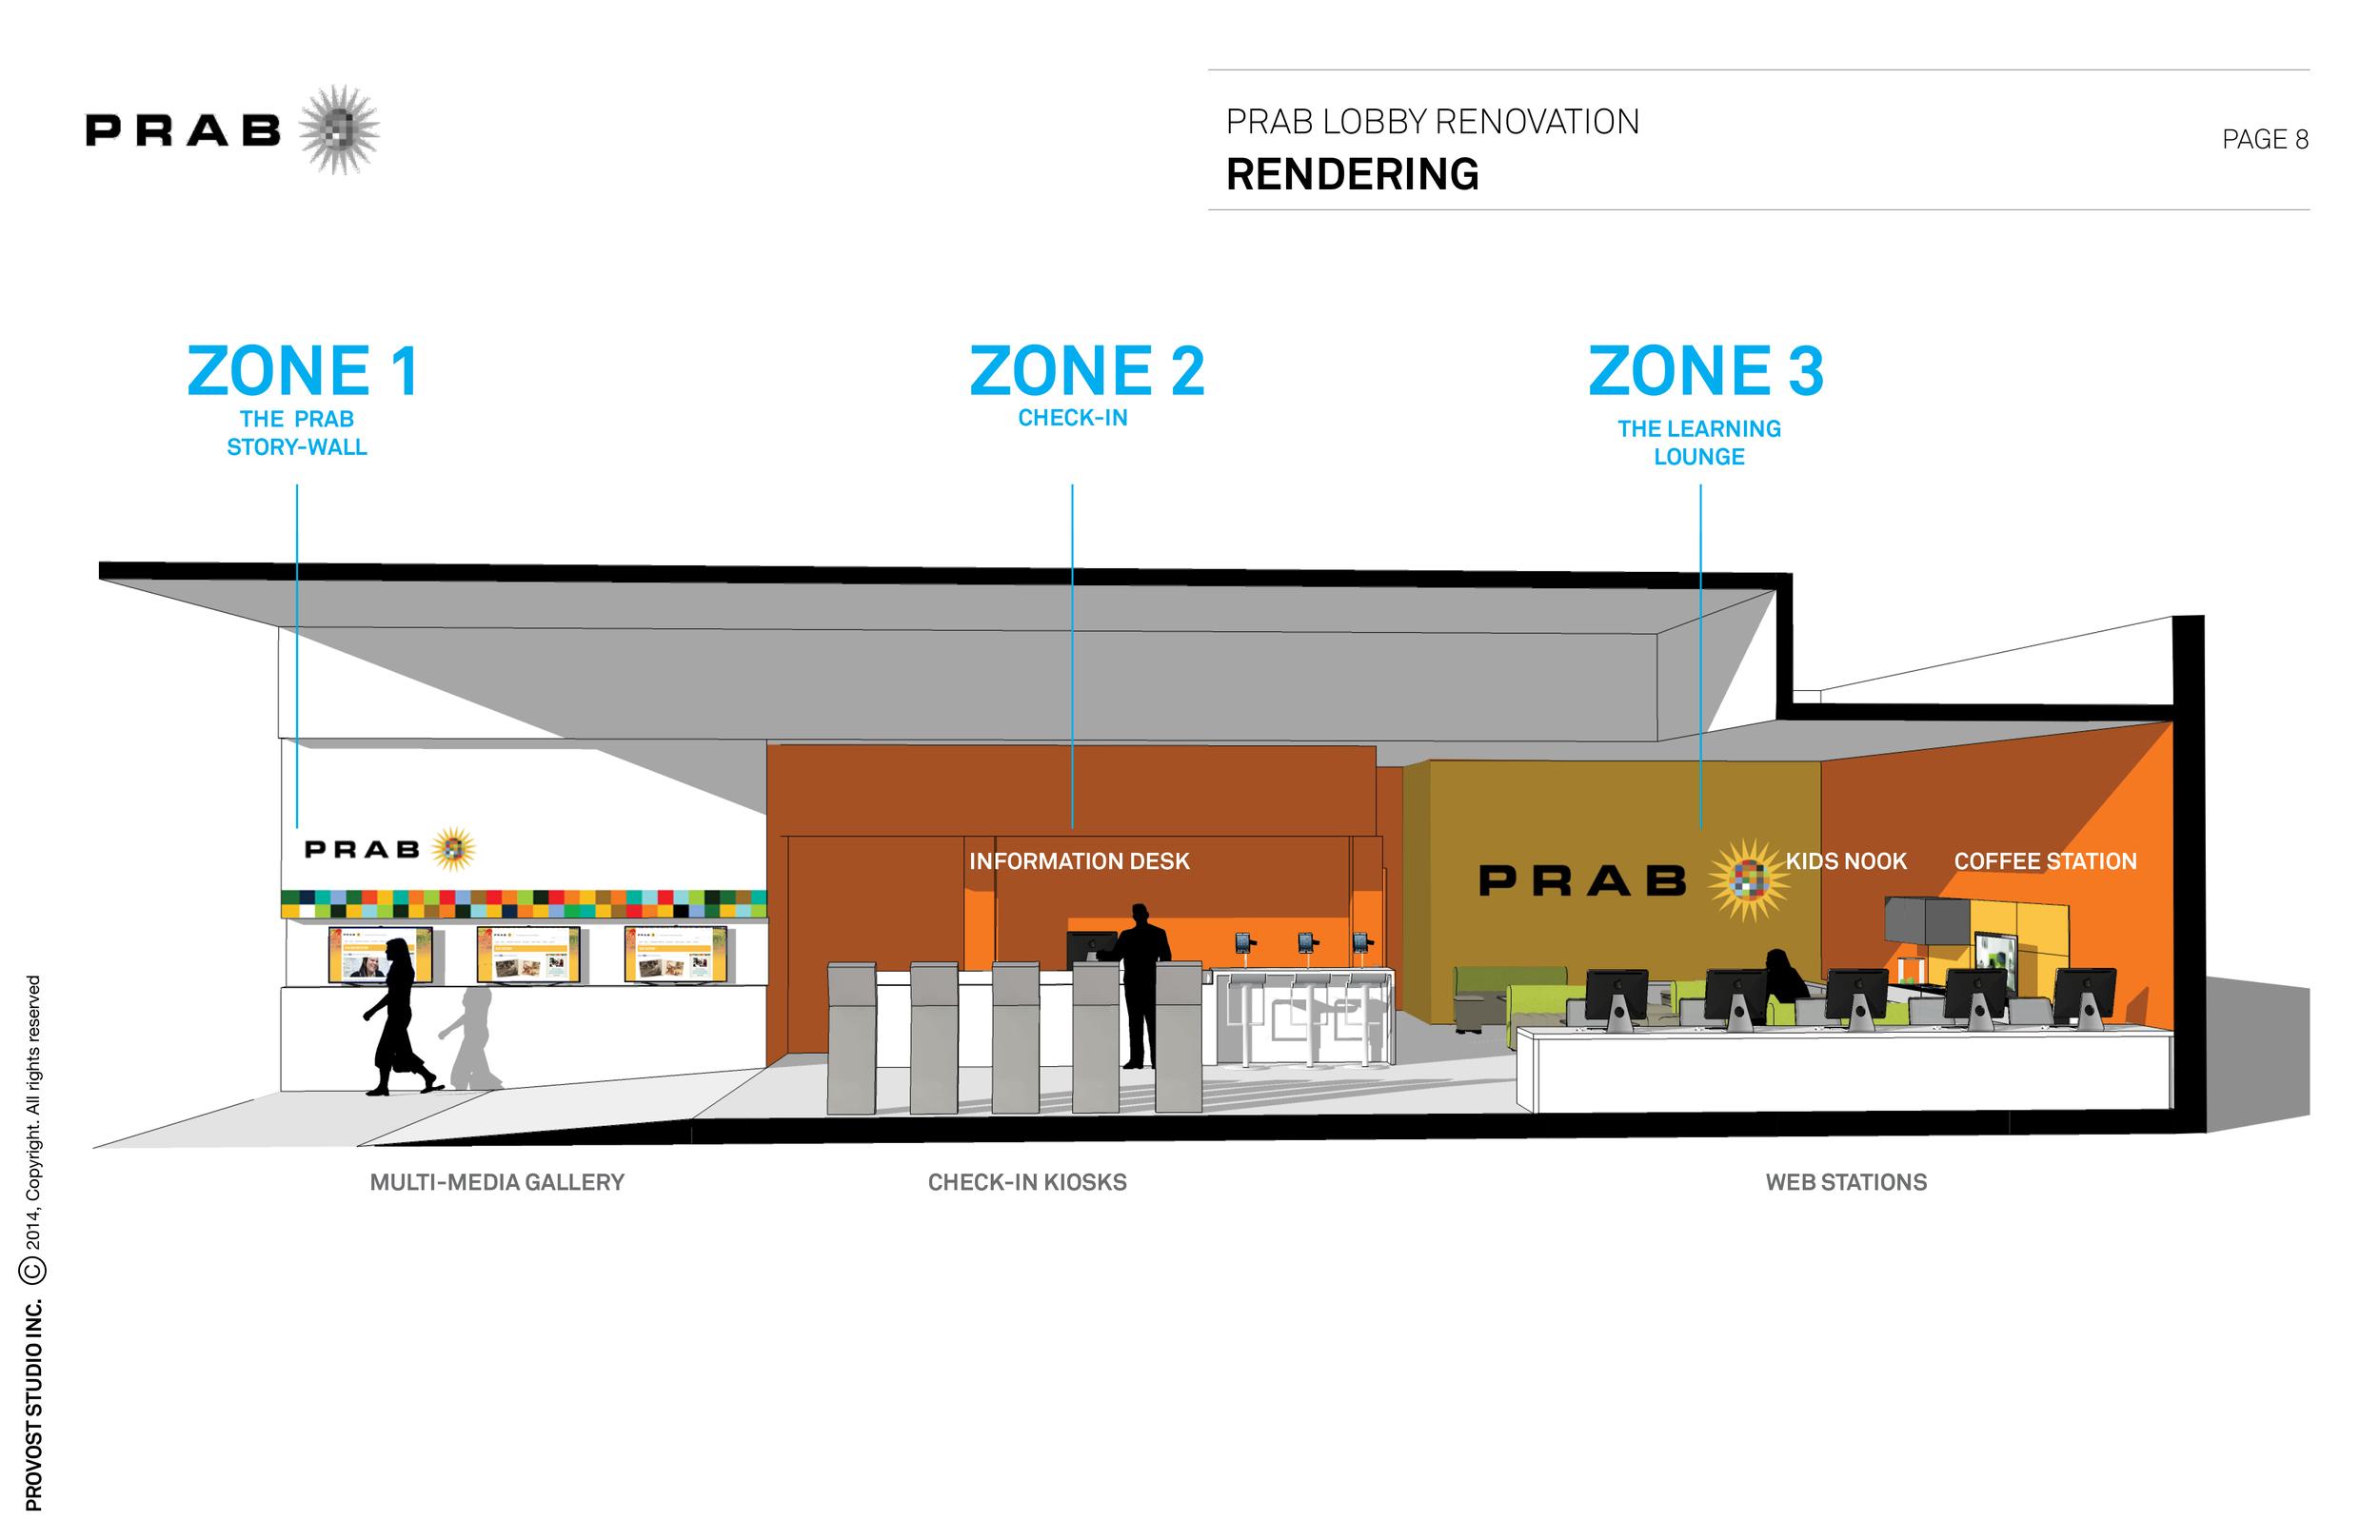 09192019_100pm_Concept Presentation_PRAB_Lobby Renovation8.jpg